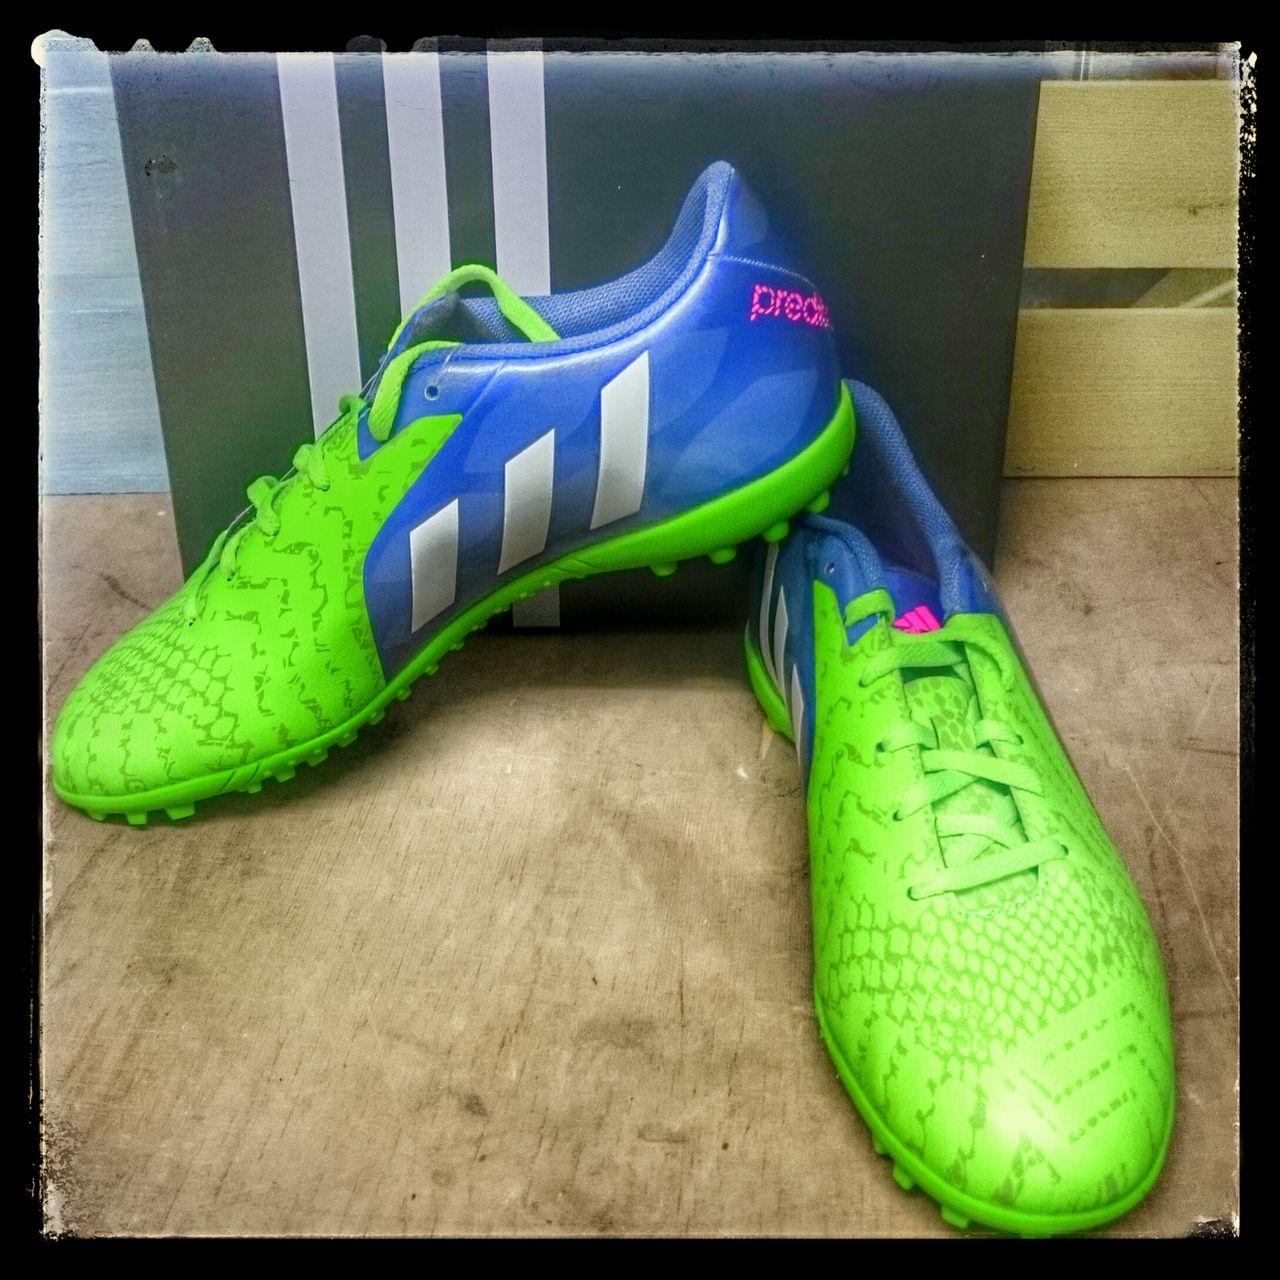 Adidas predito instinct supernatural turf football